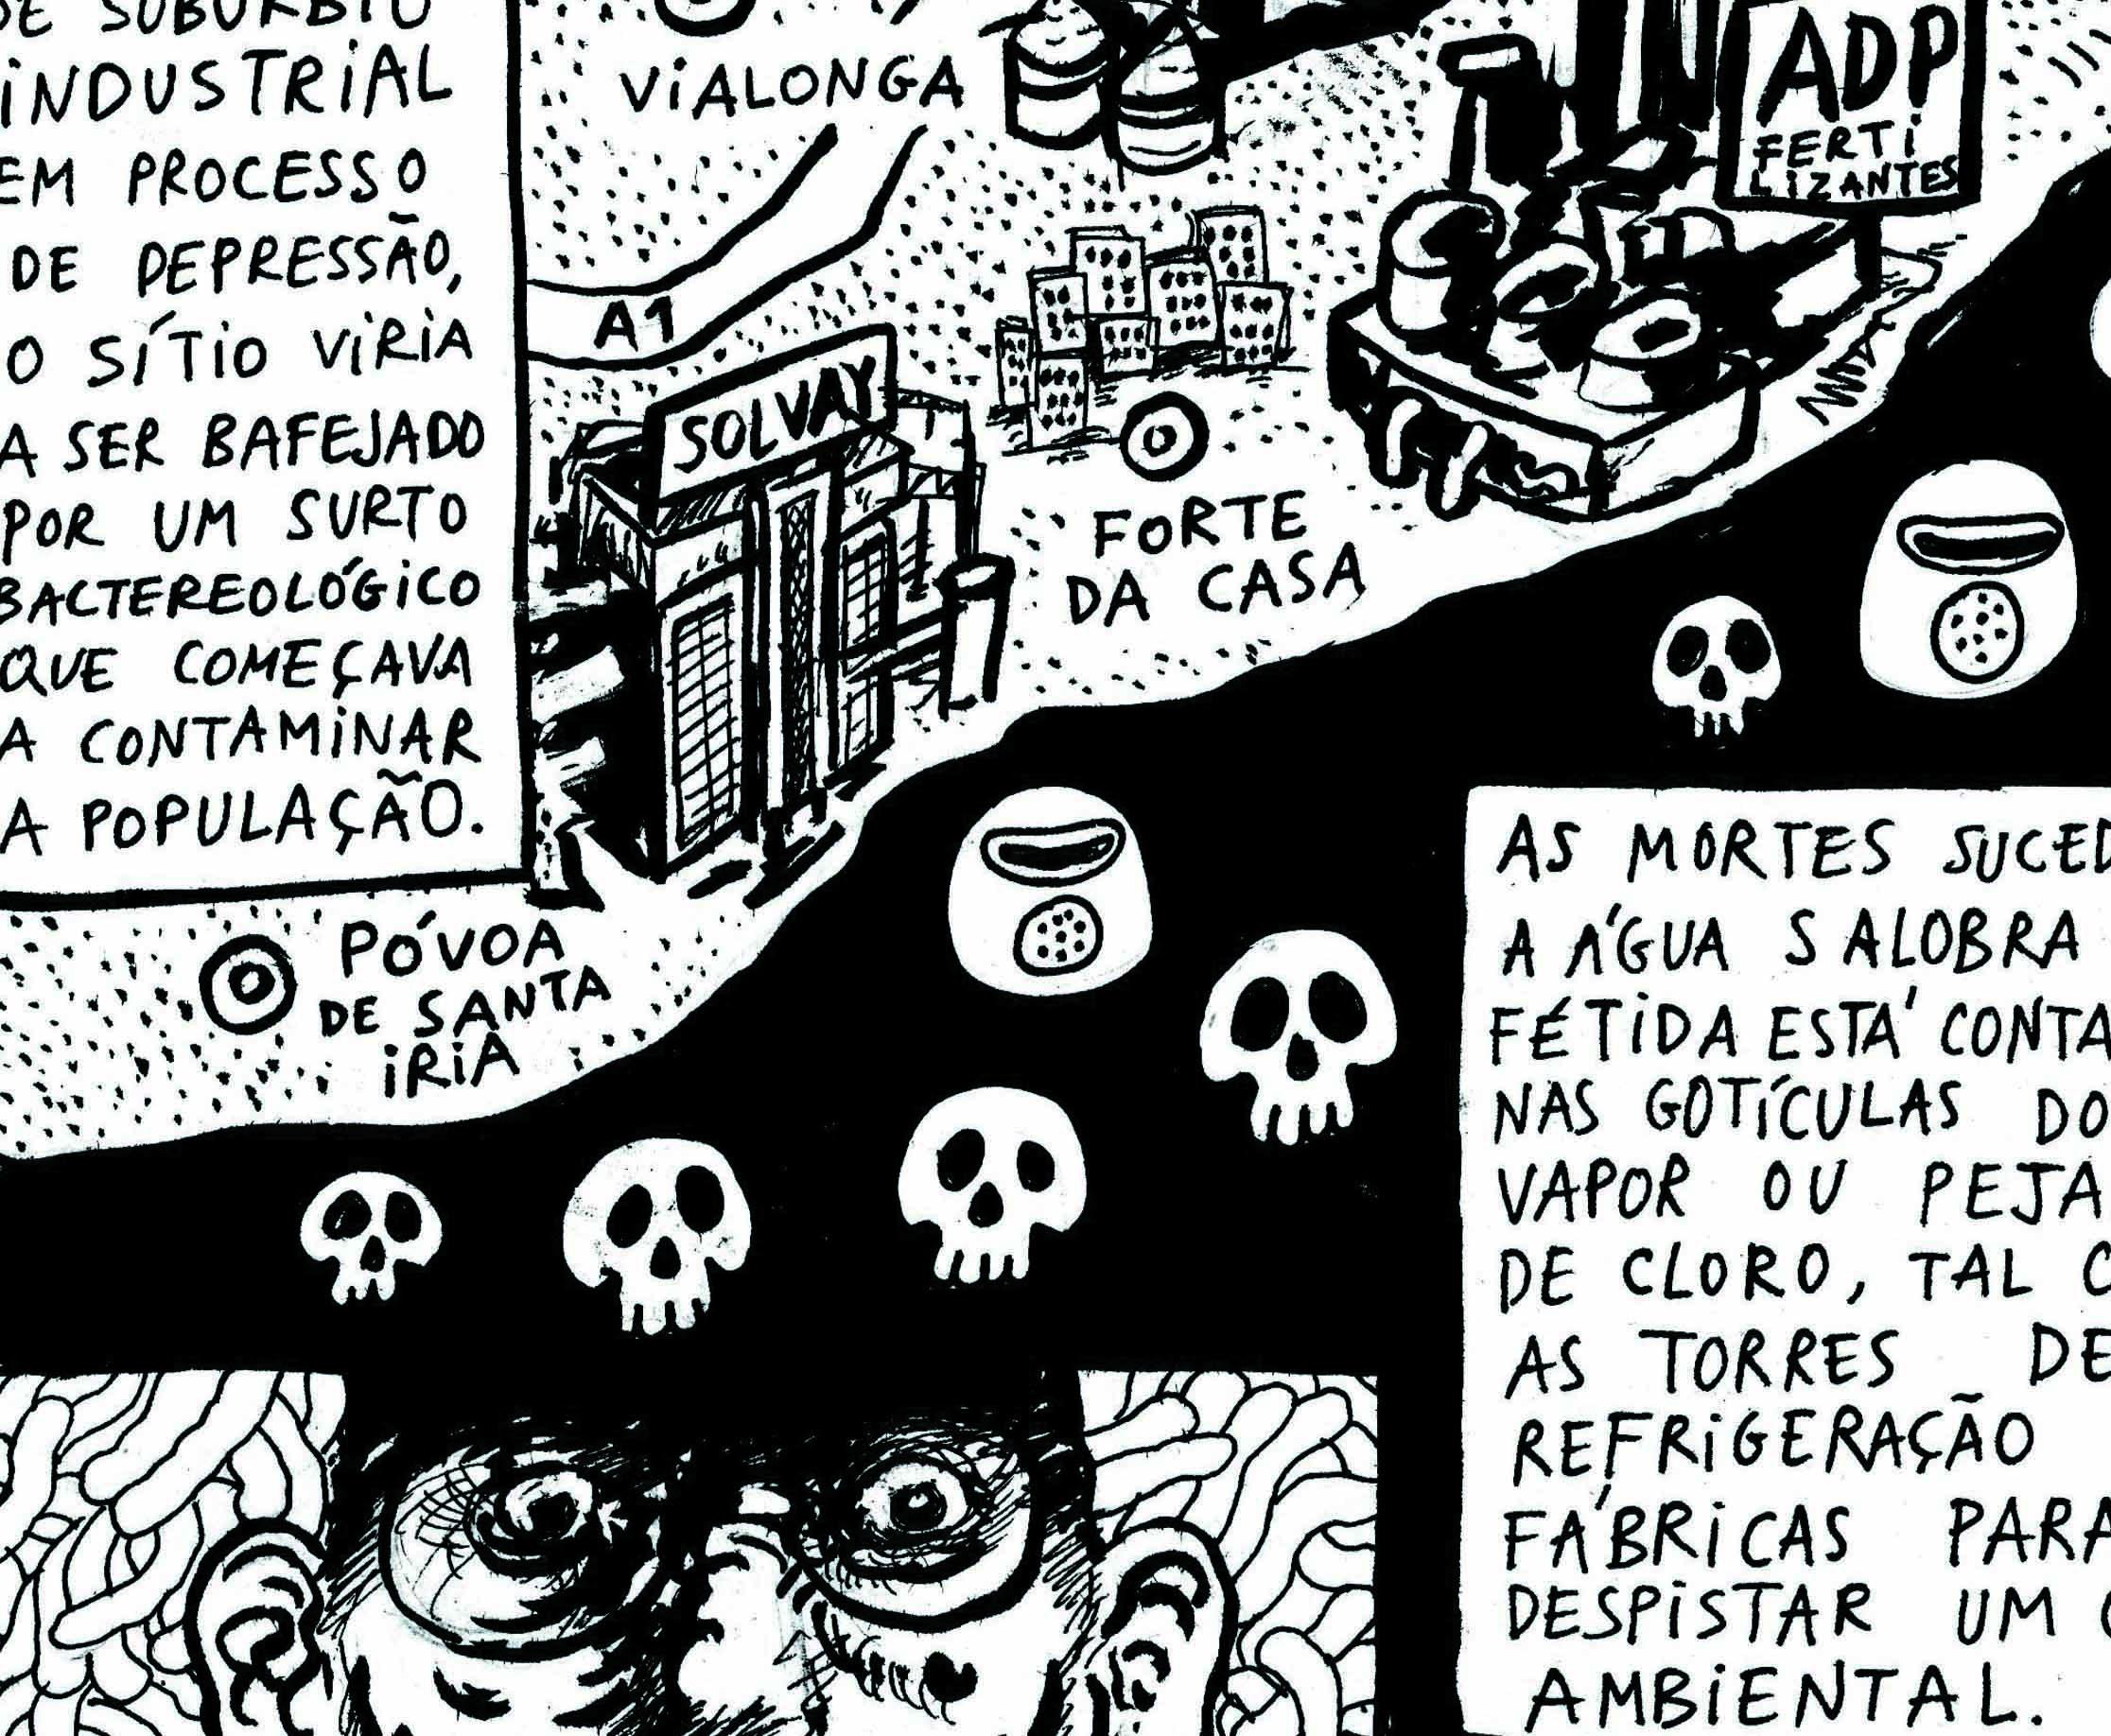 Morte na Póvoa de Sta Iria (Mapa Borrado #8)